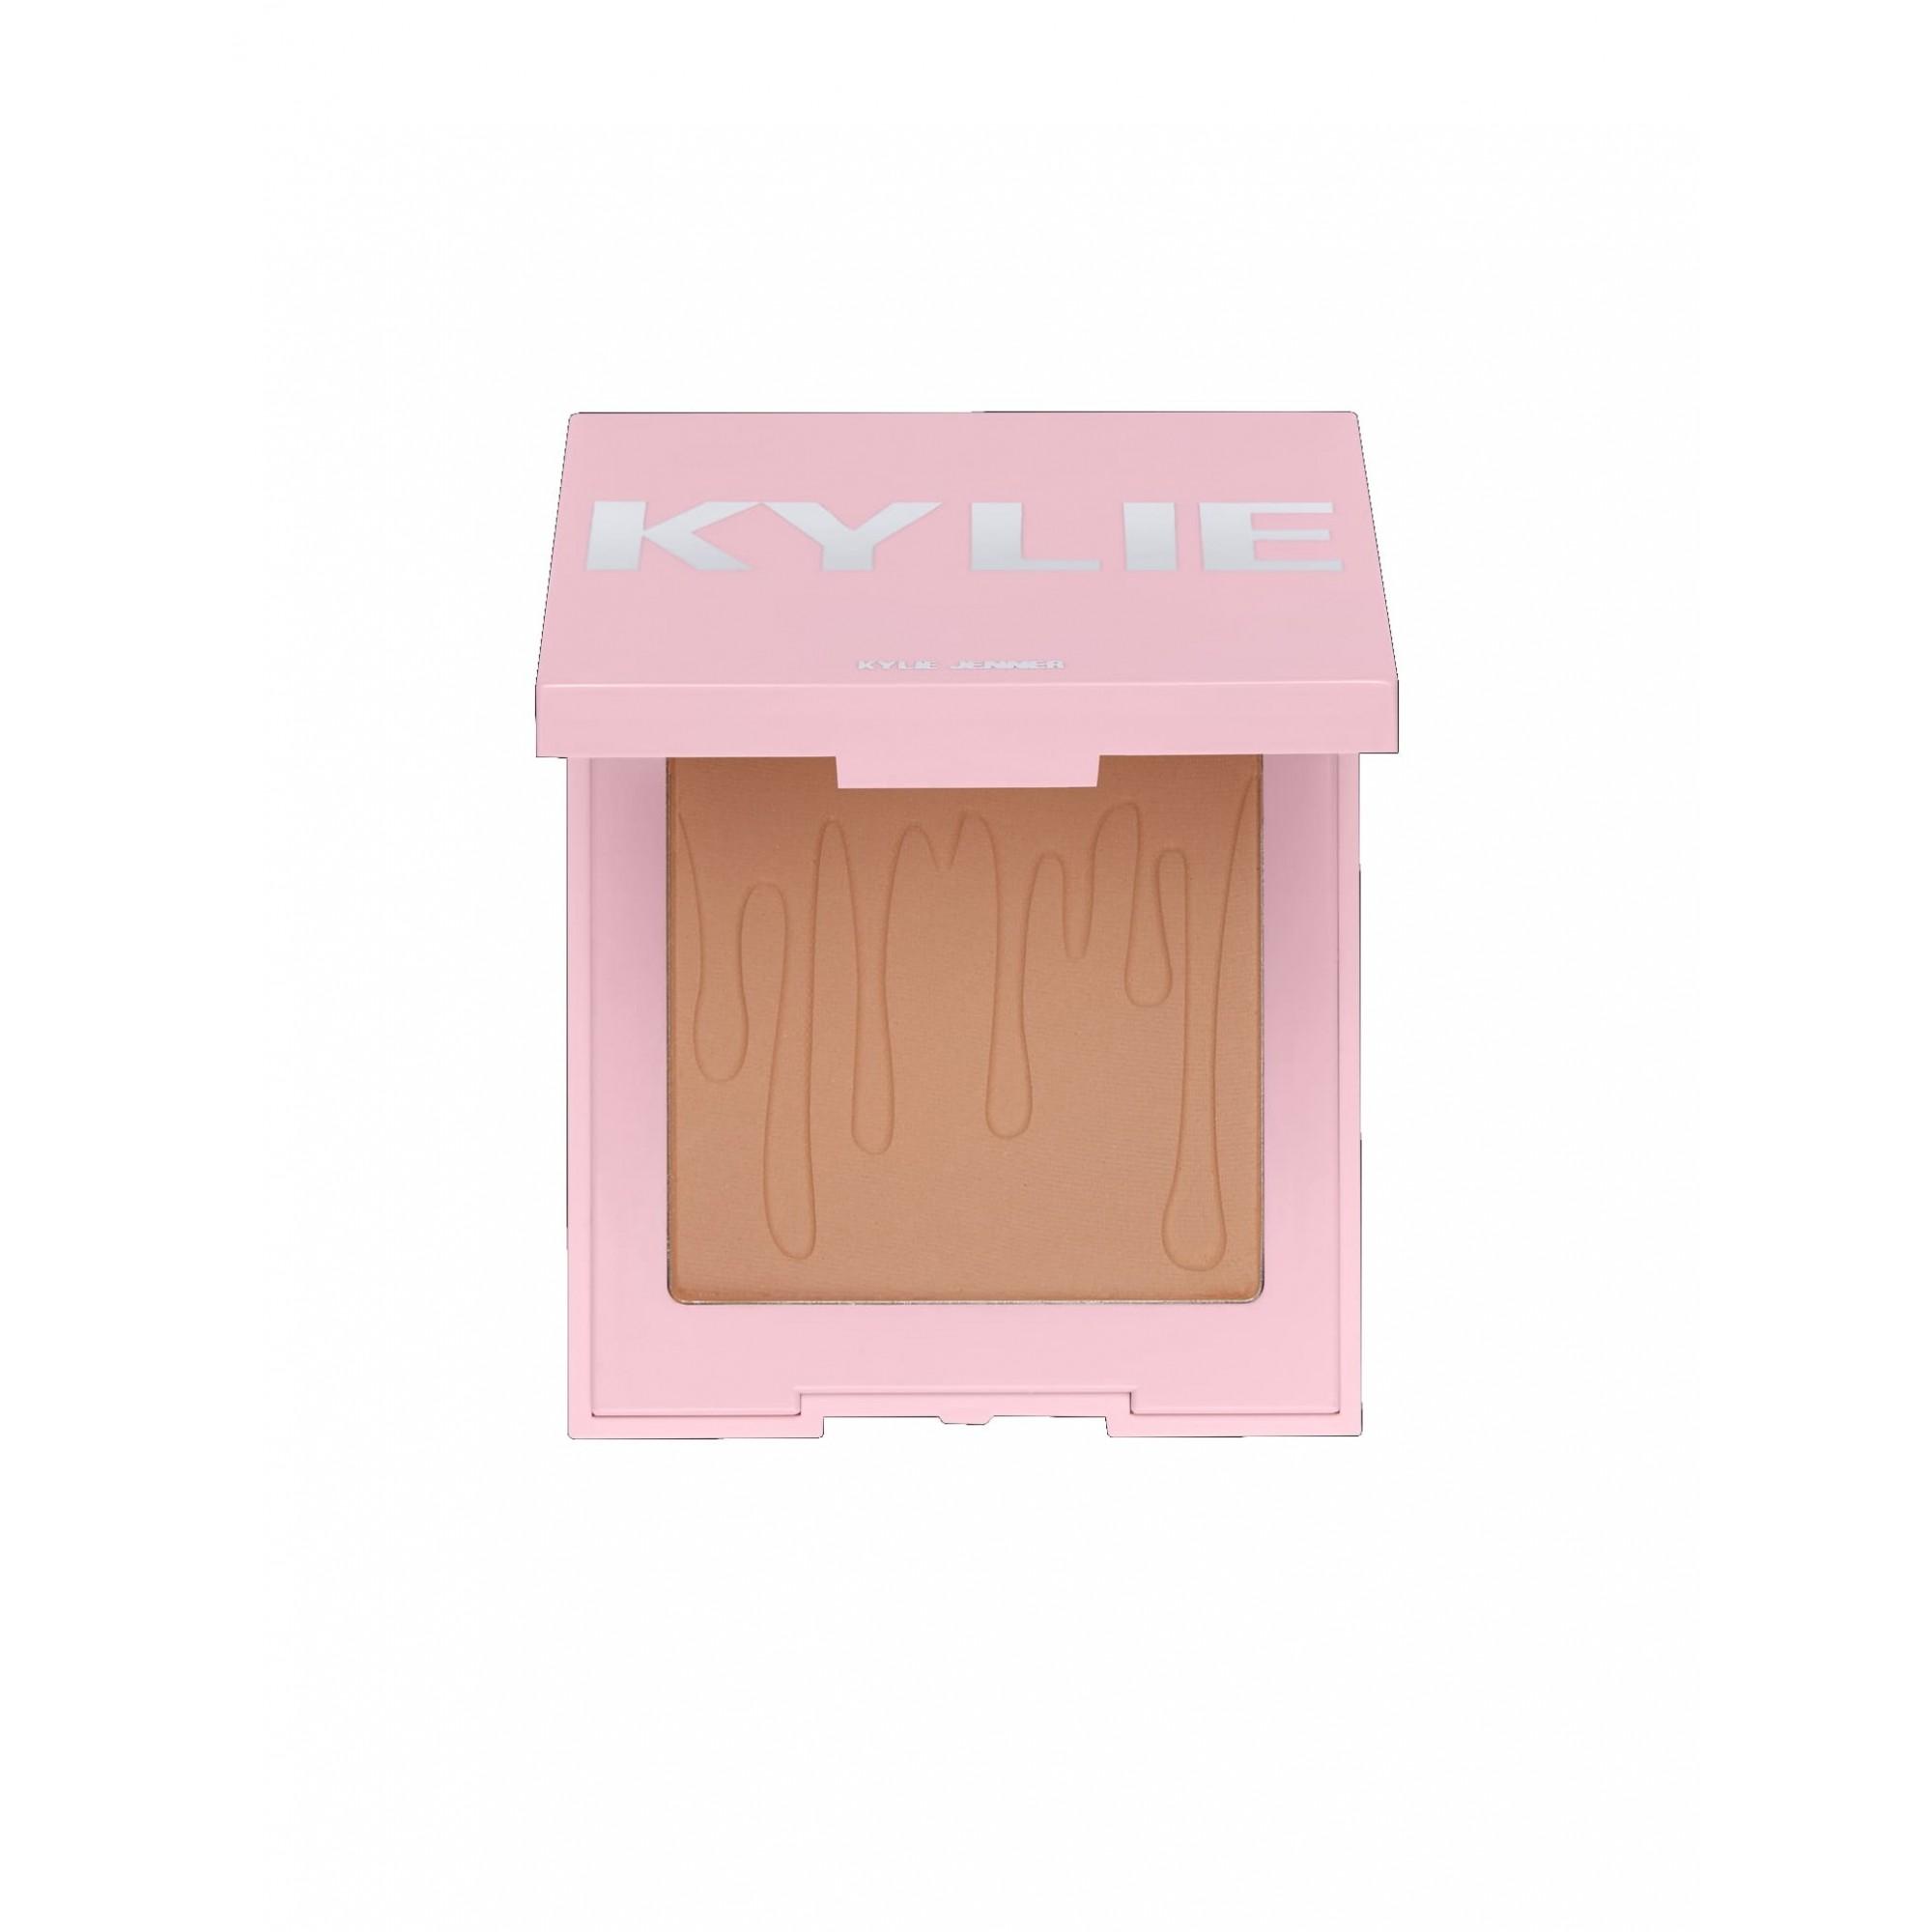 Kylie Cosmetics Tequila Tan Bronzer